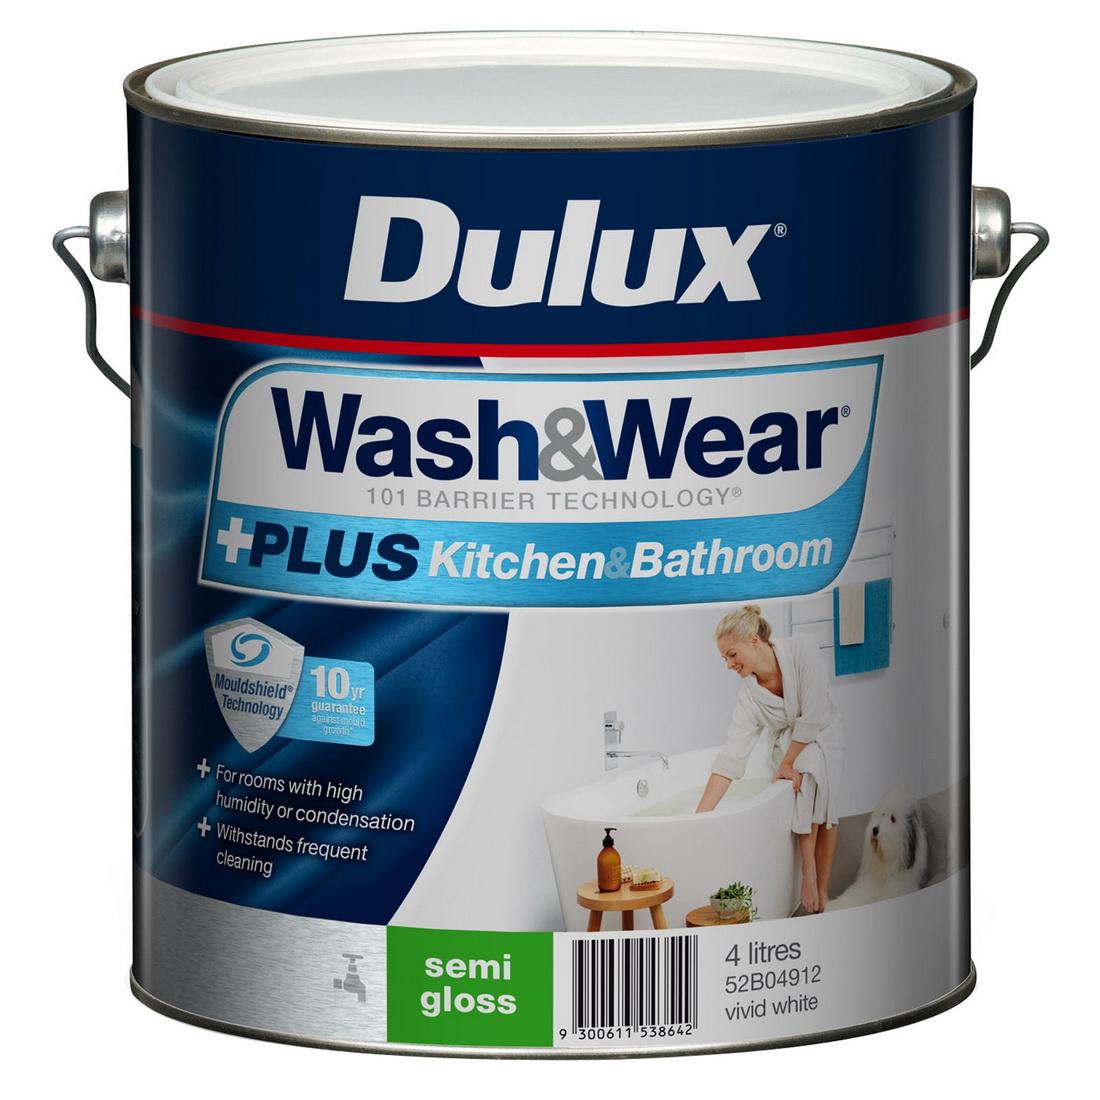 Wash And Wear Plus Kitchen And Bathroom Semi Gloss Vivid White 4L